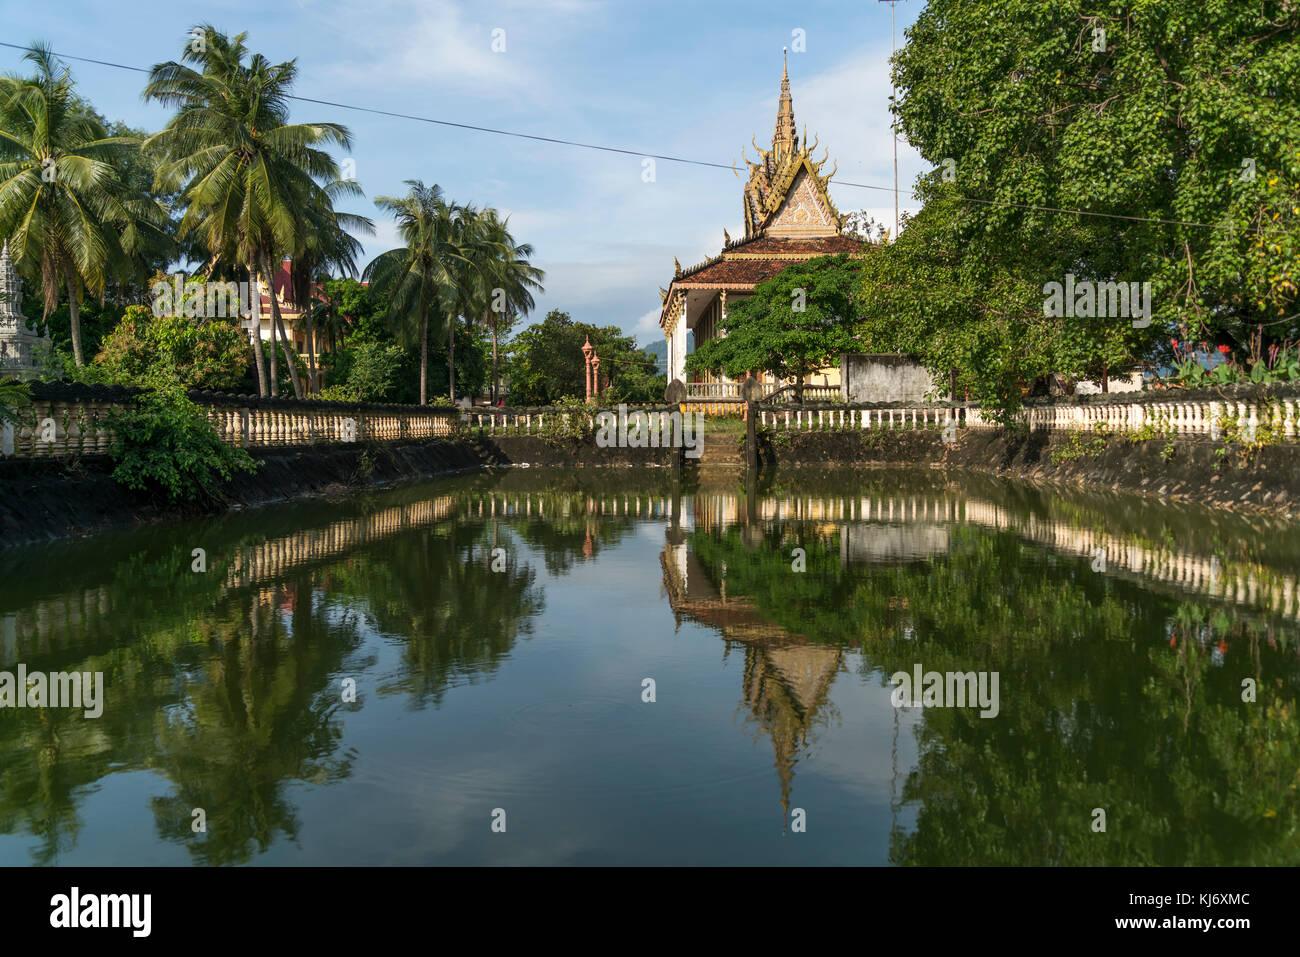 buddhistischer Tempel in Kampot, Kambodscha, Asien  | buddhist Wat in  Kampot, Cambodia, Asia Stock Photo